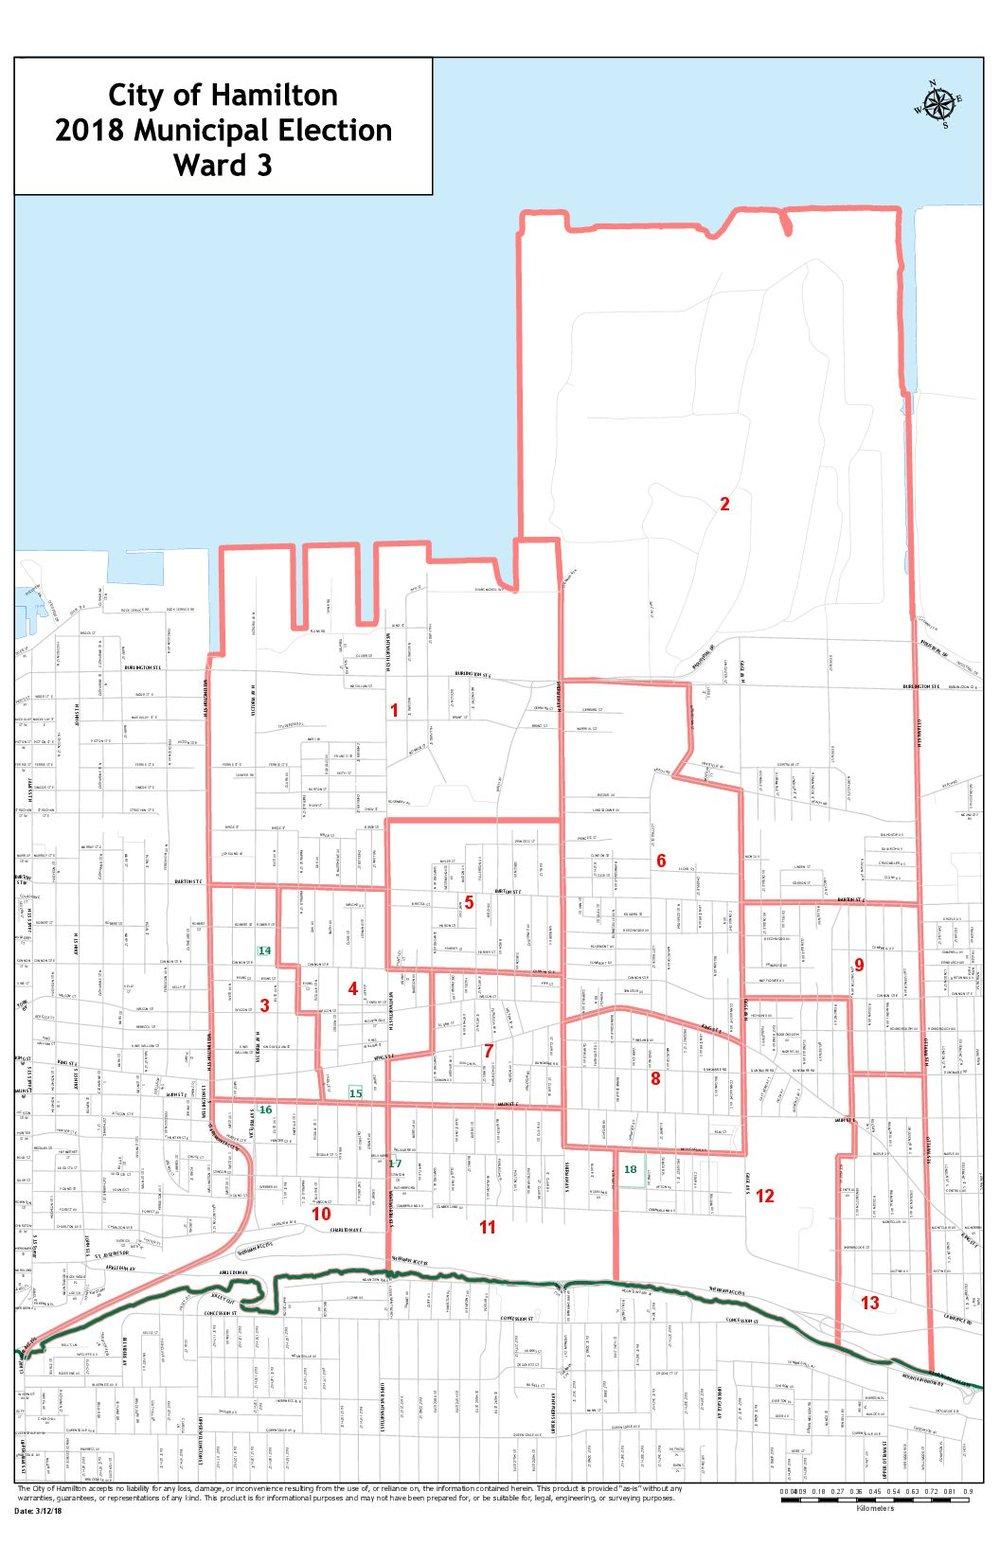 City-of-Hamilton-2018-Municipal-Election-Ward-3-Polling-Divisions-Map.jpg